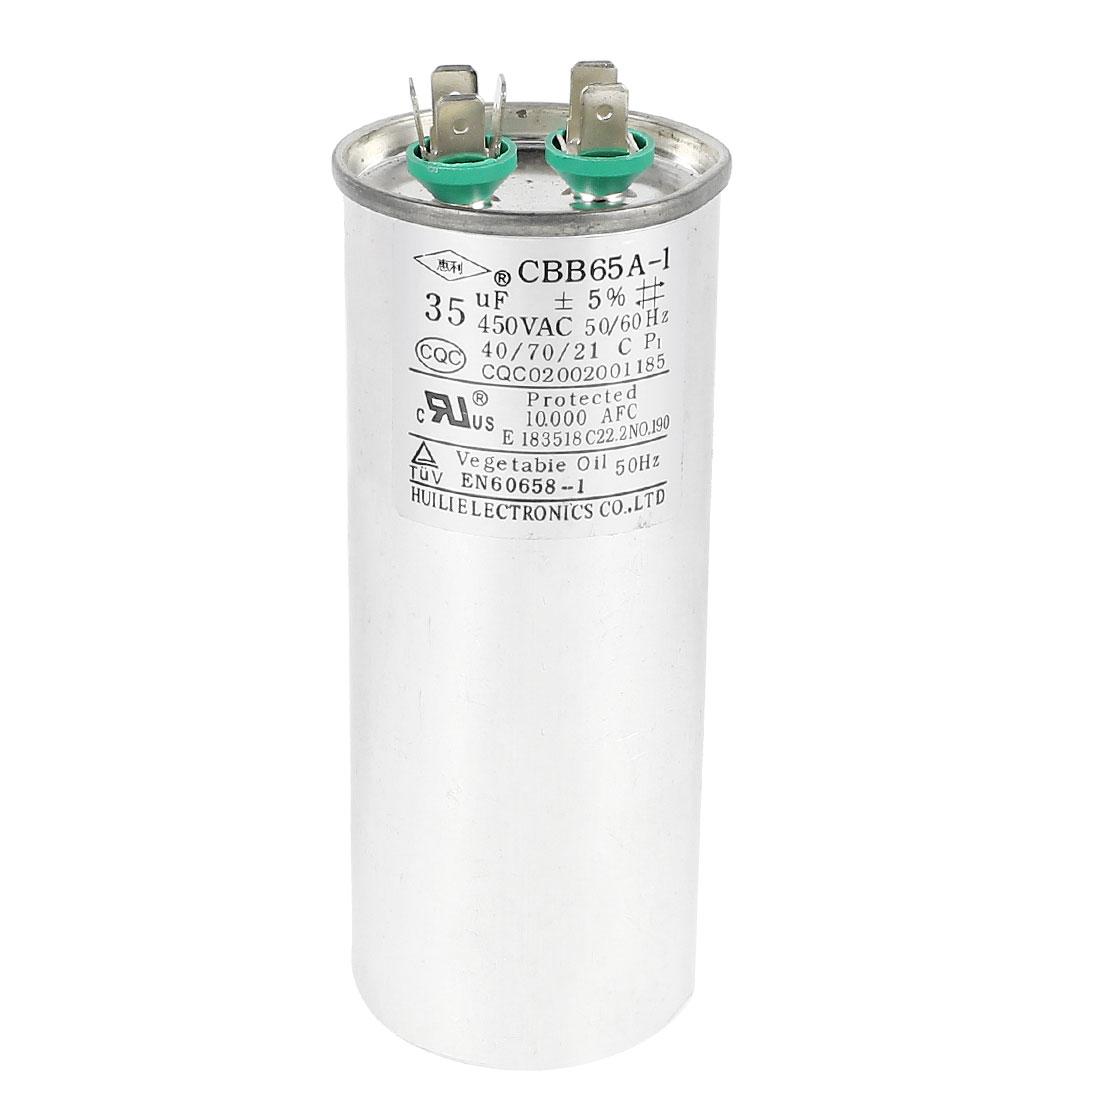 AC 450V 35uF CBB65A-1 6 Terminals Air Conditioner Motor Run Capacitor